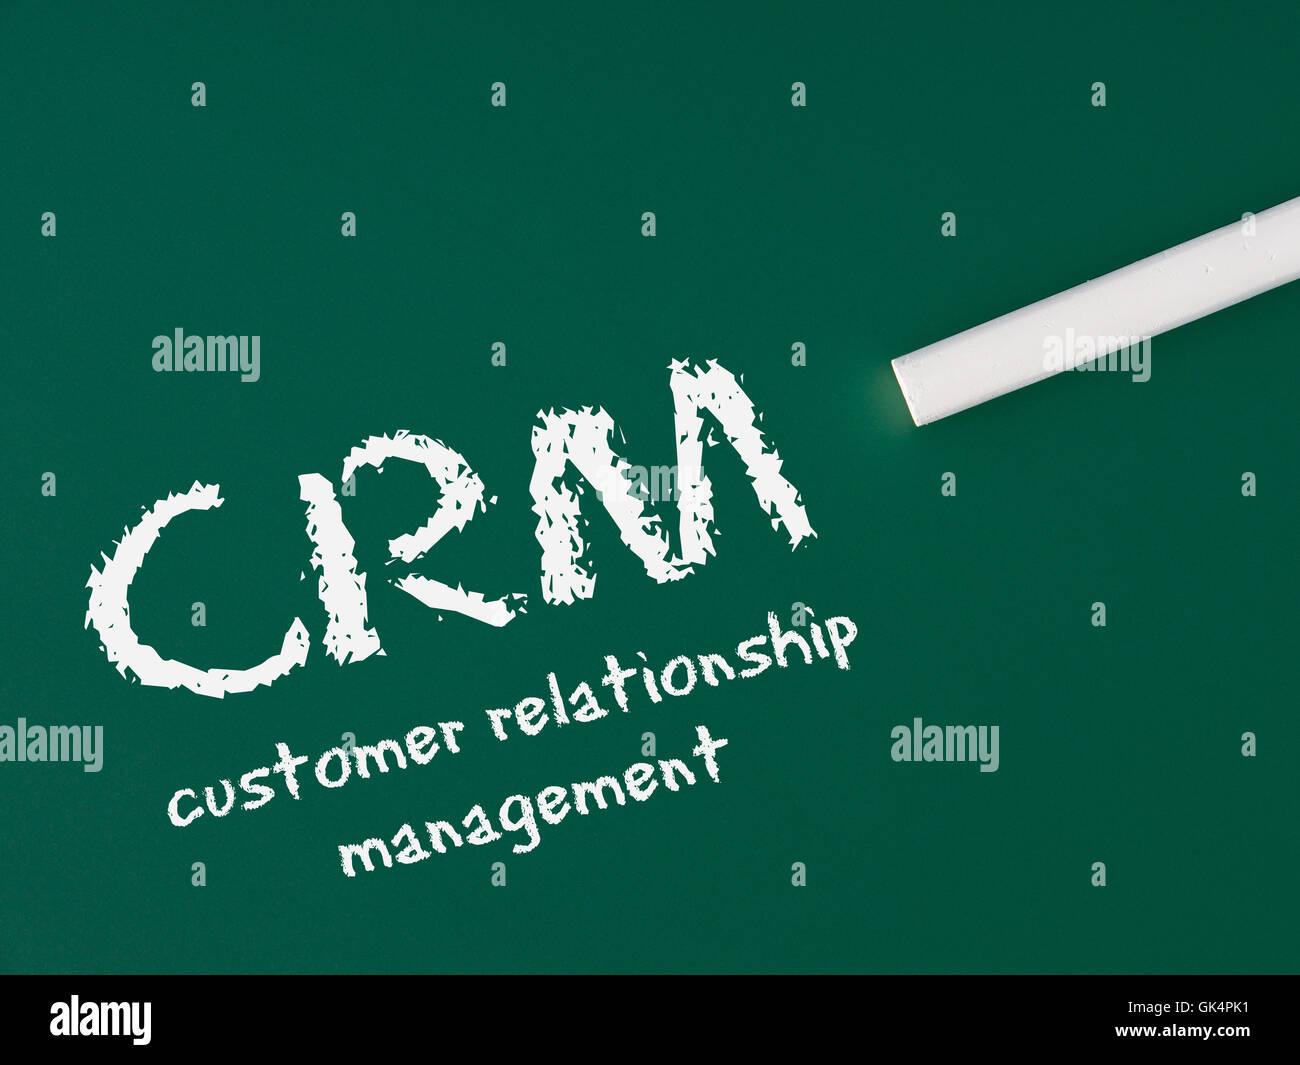 crm - customer relationship management - Stock Image